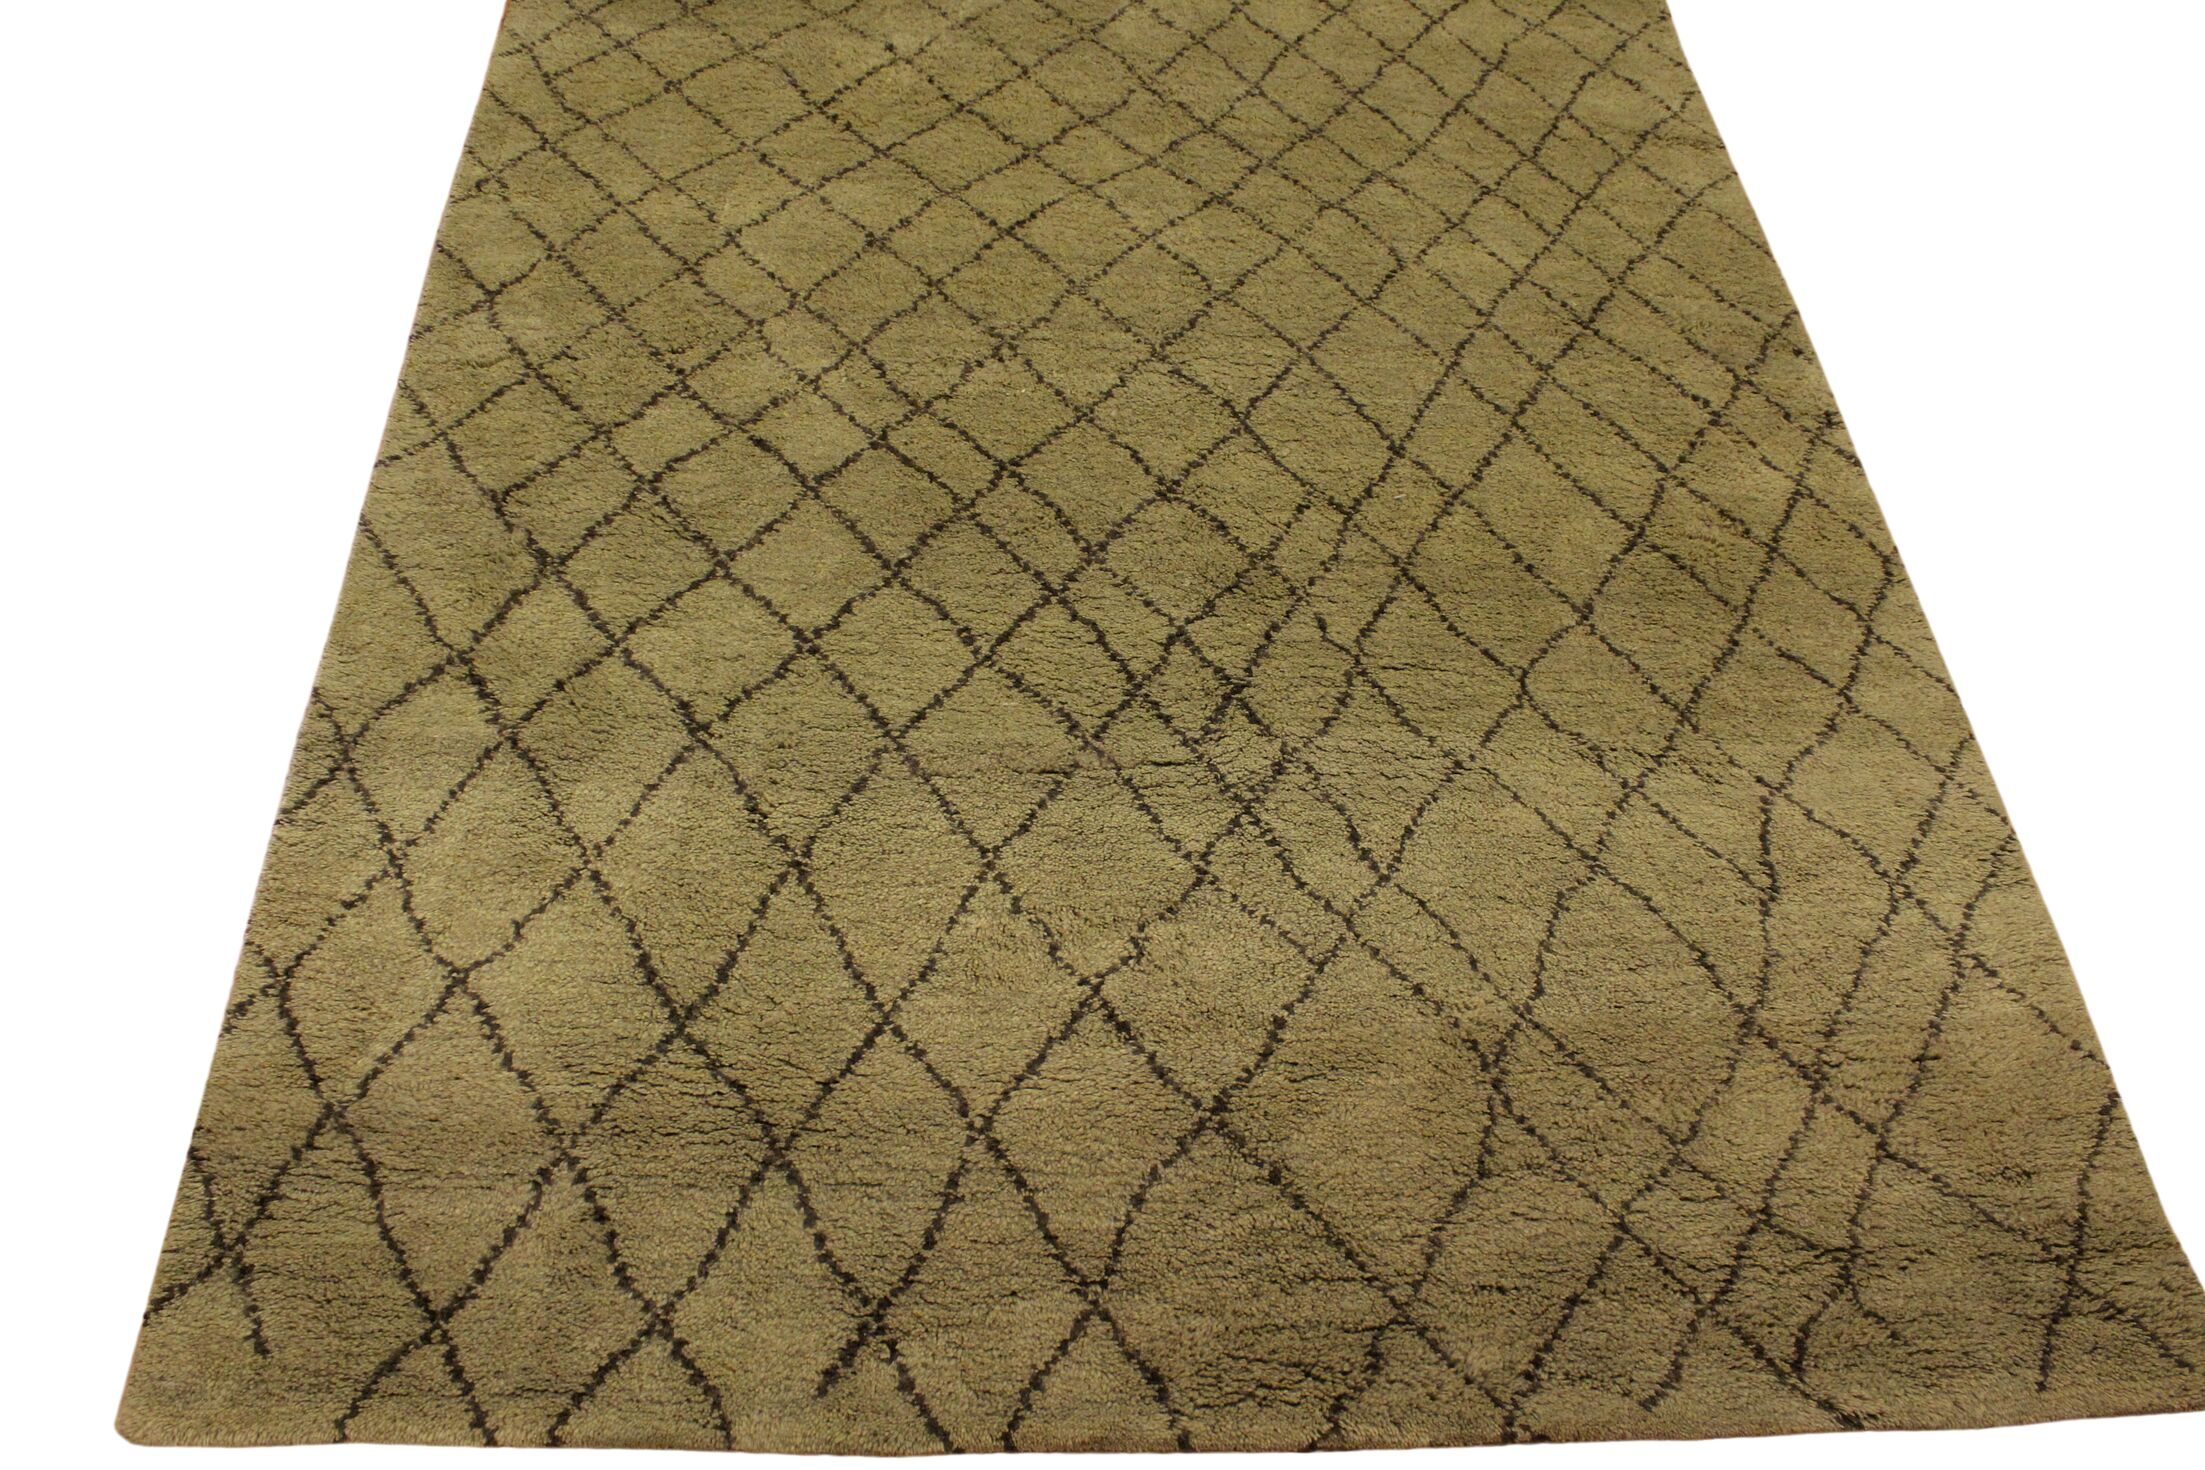 Crosslin Hand Knotted Wool Green/Dark Brown Indoor Area Rug Rug Size: Rectangle 4'1